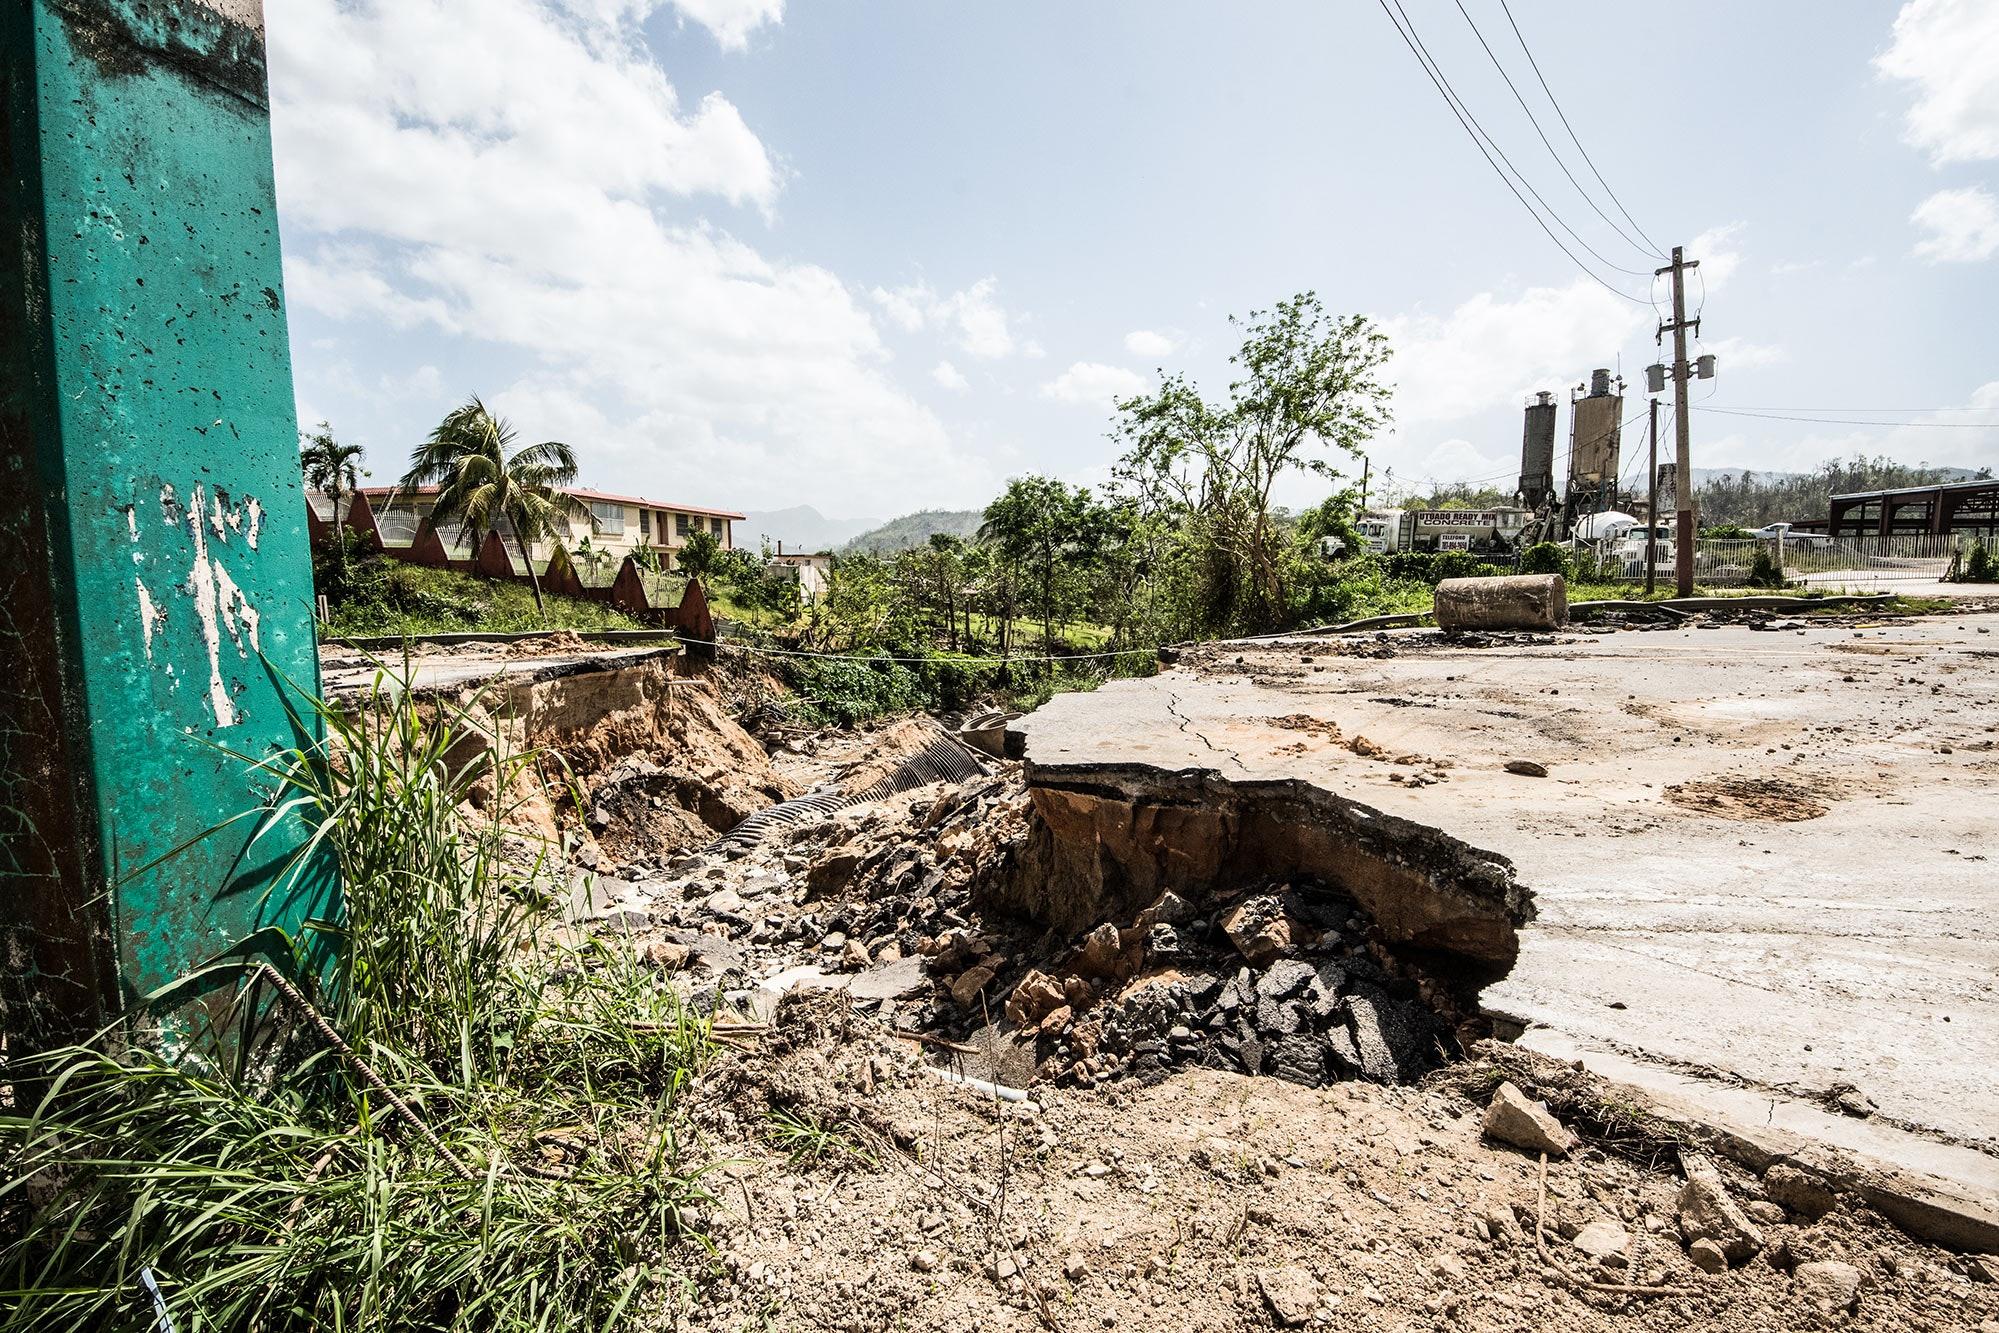 Mud slide after Hurricane Maria